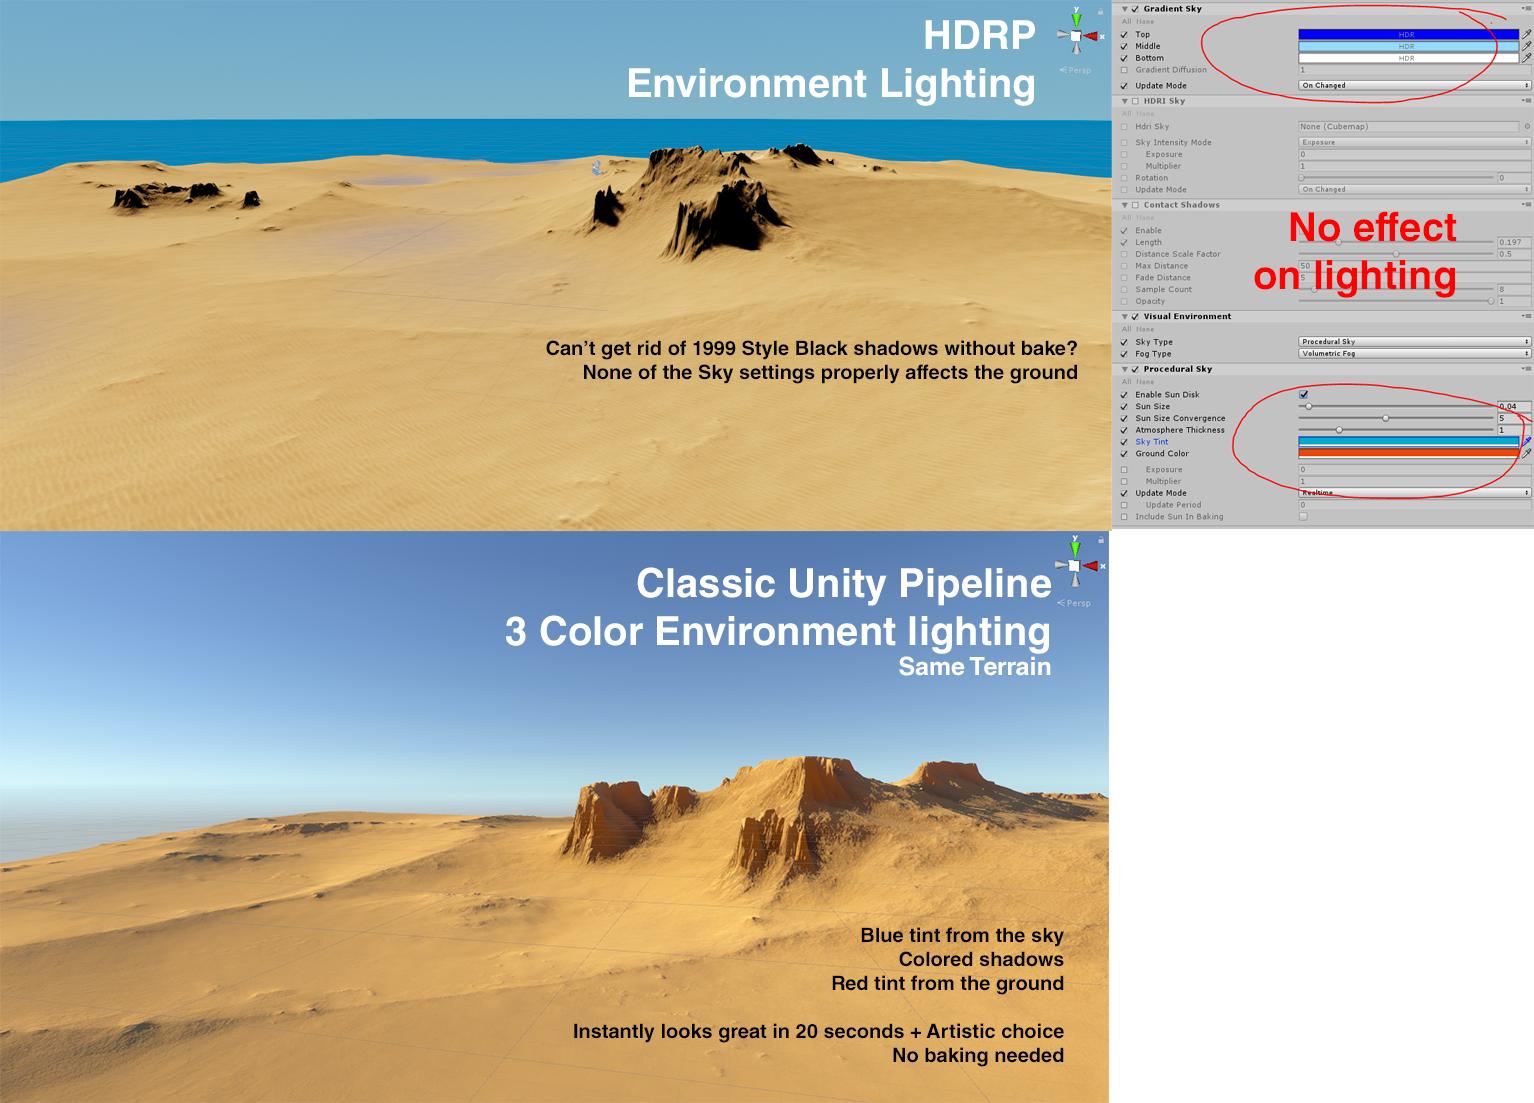 HDRP vs SD Environment Lighting Comparison - Environment lighting